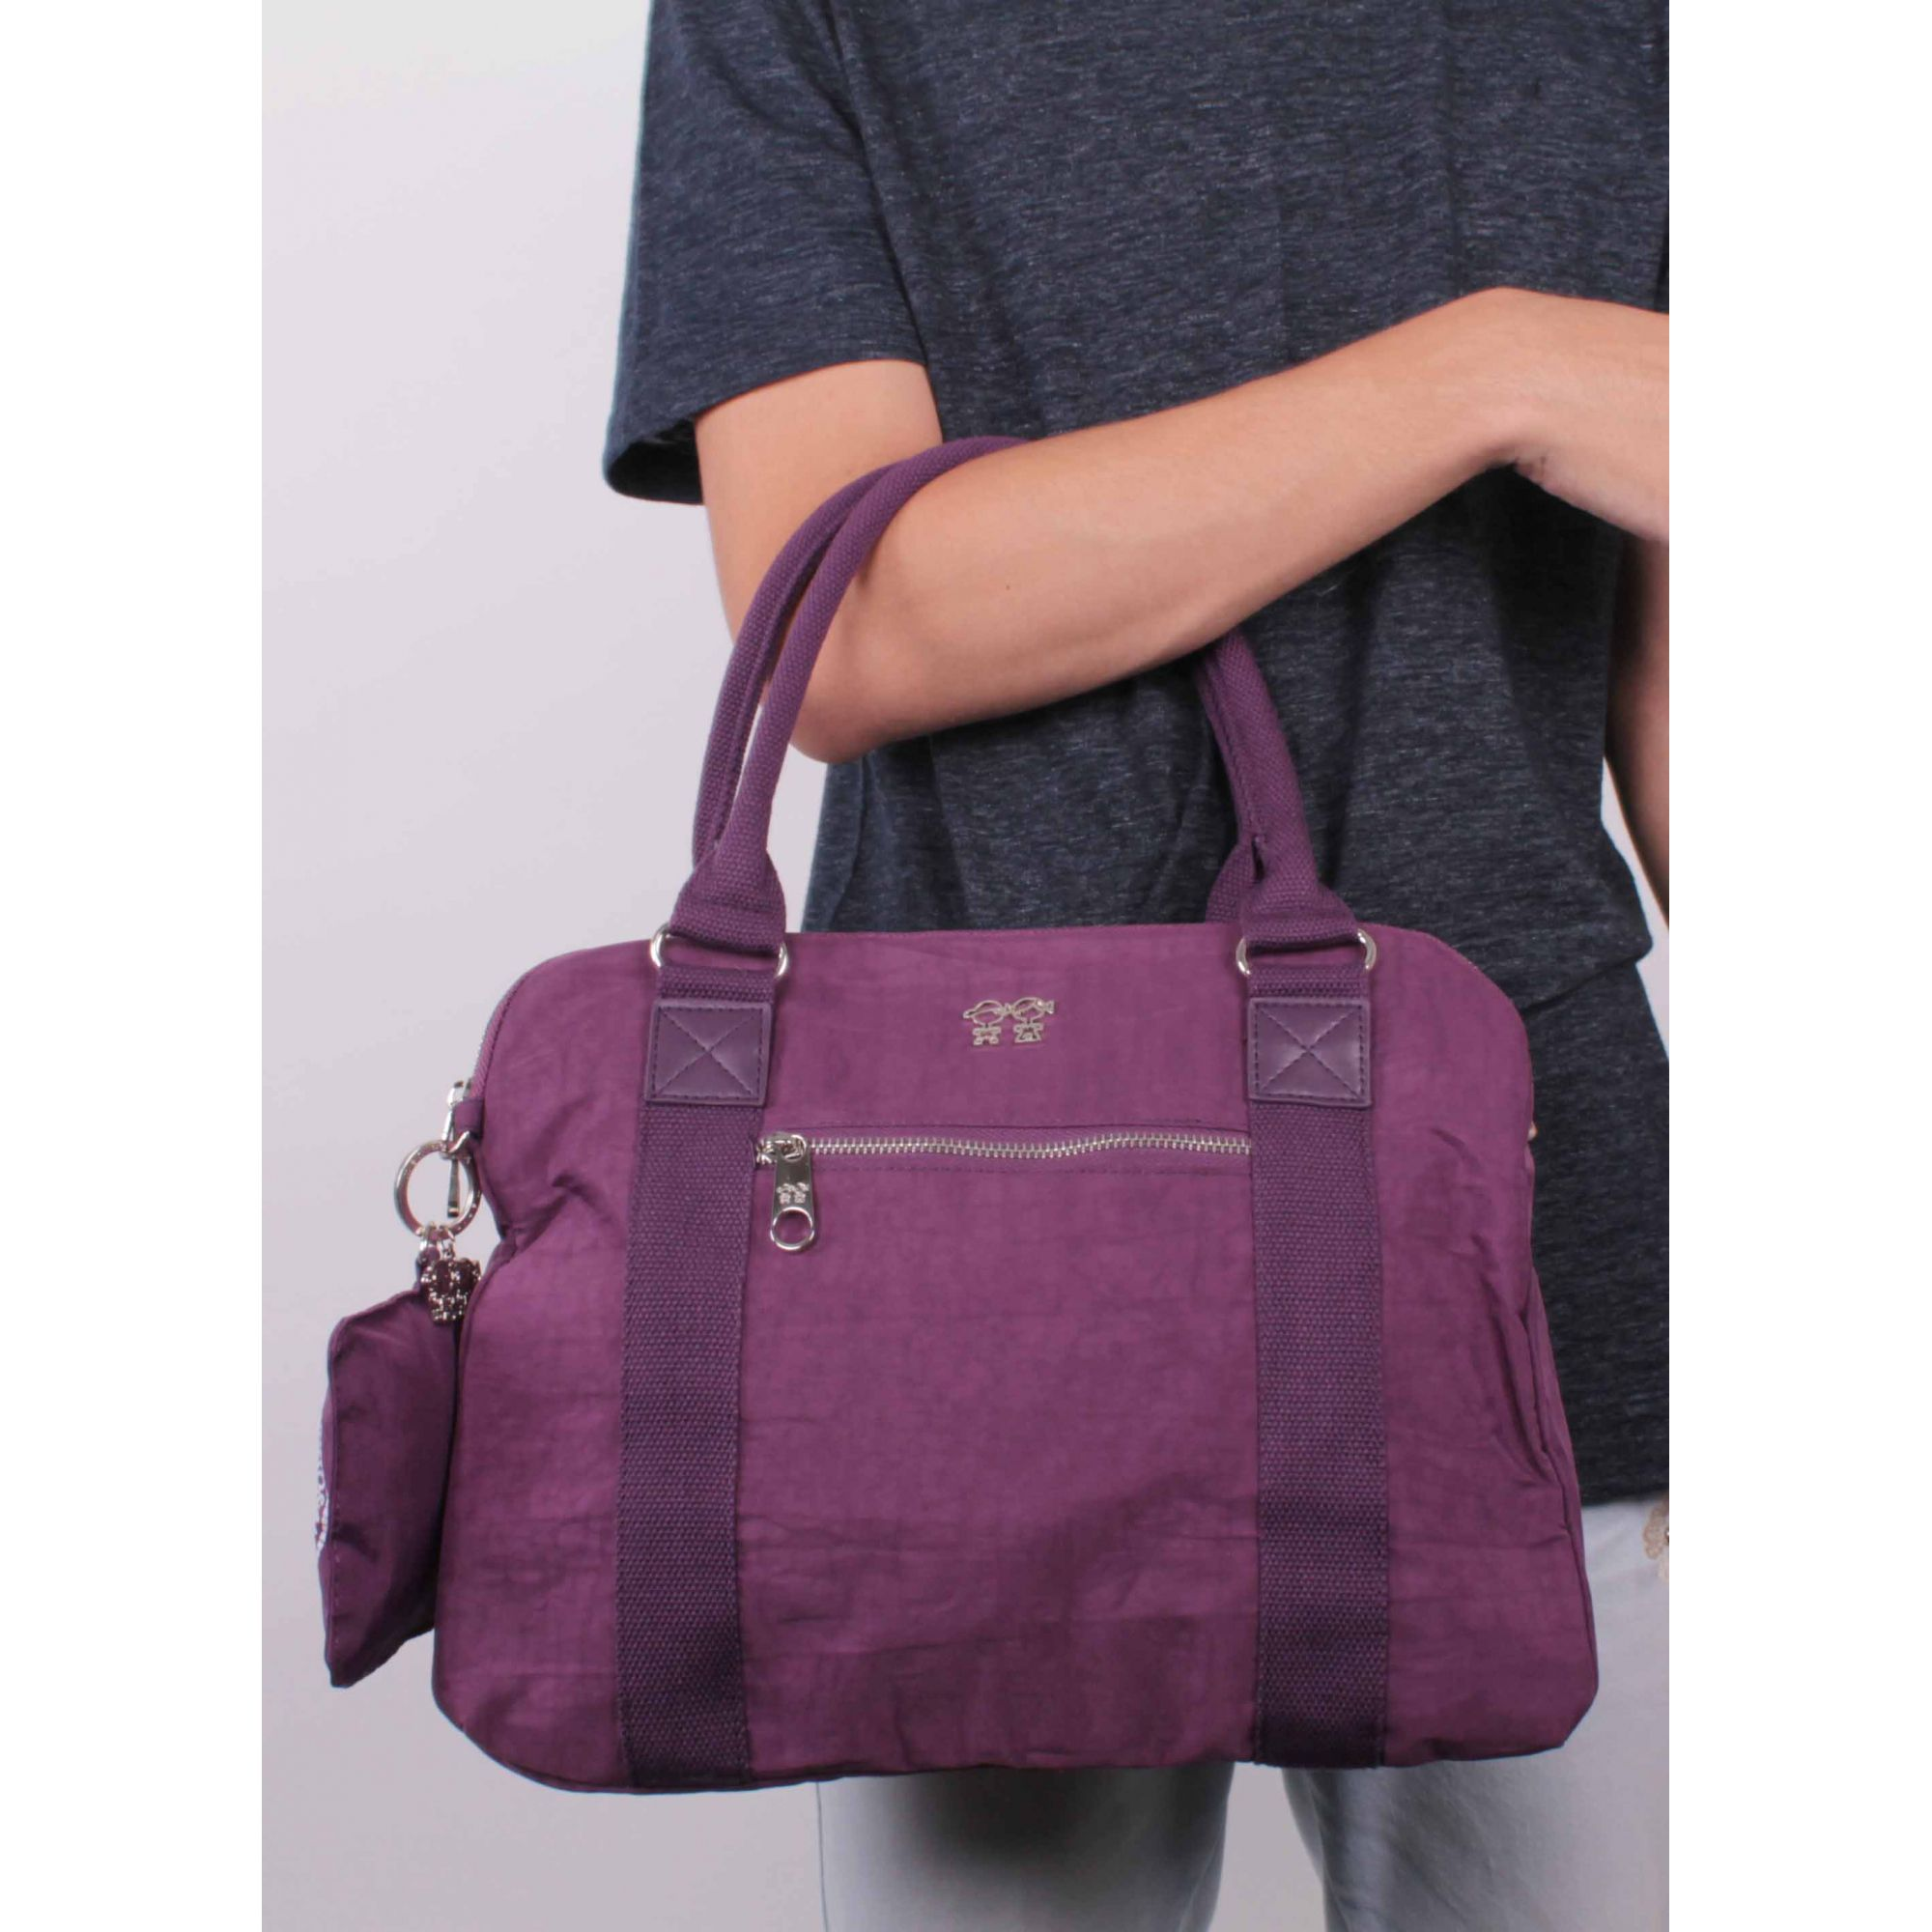 Bolsa Feminina Transversal - Nylon - MENINO&MENINA - HT6031  - Menino_Menina